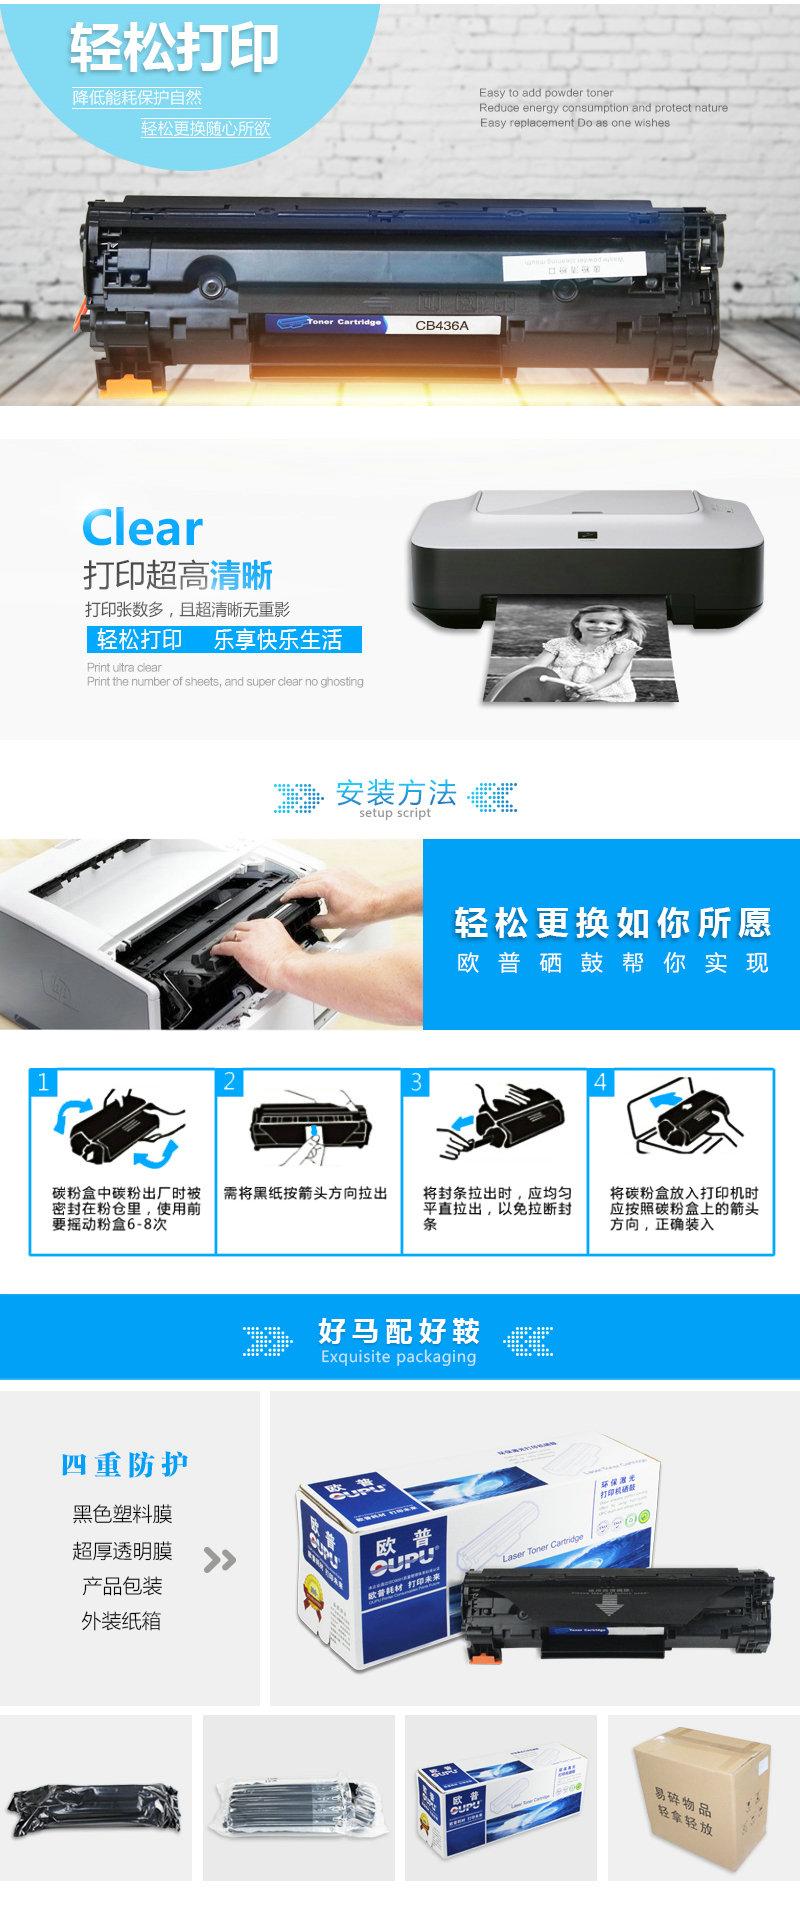 manbetx万博体育平台CB436A万博manbetx官网manbetx手机版 - 登陆2